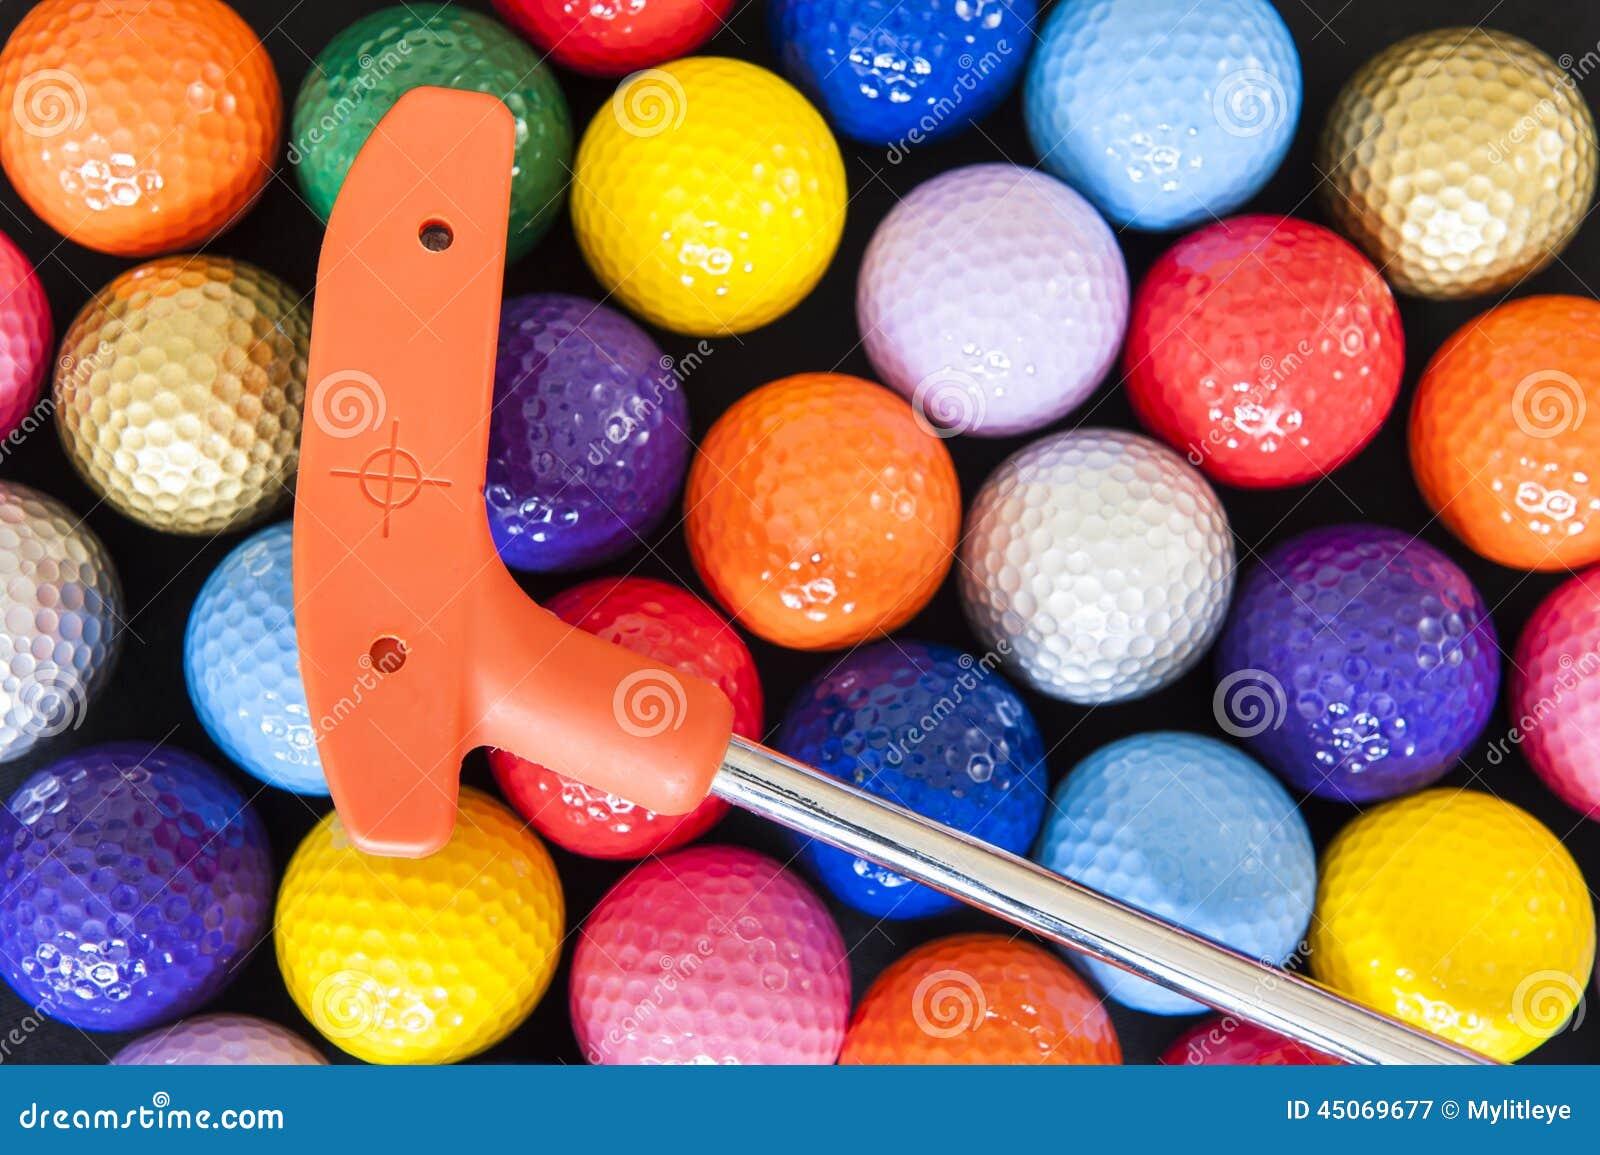 Mini Golf Balls and Club